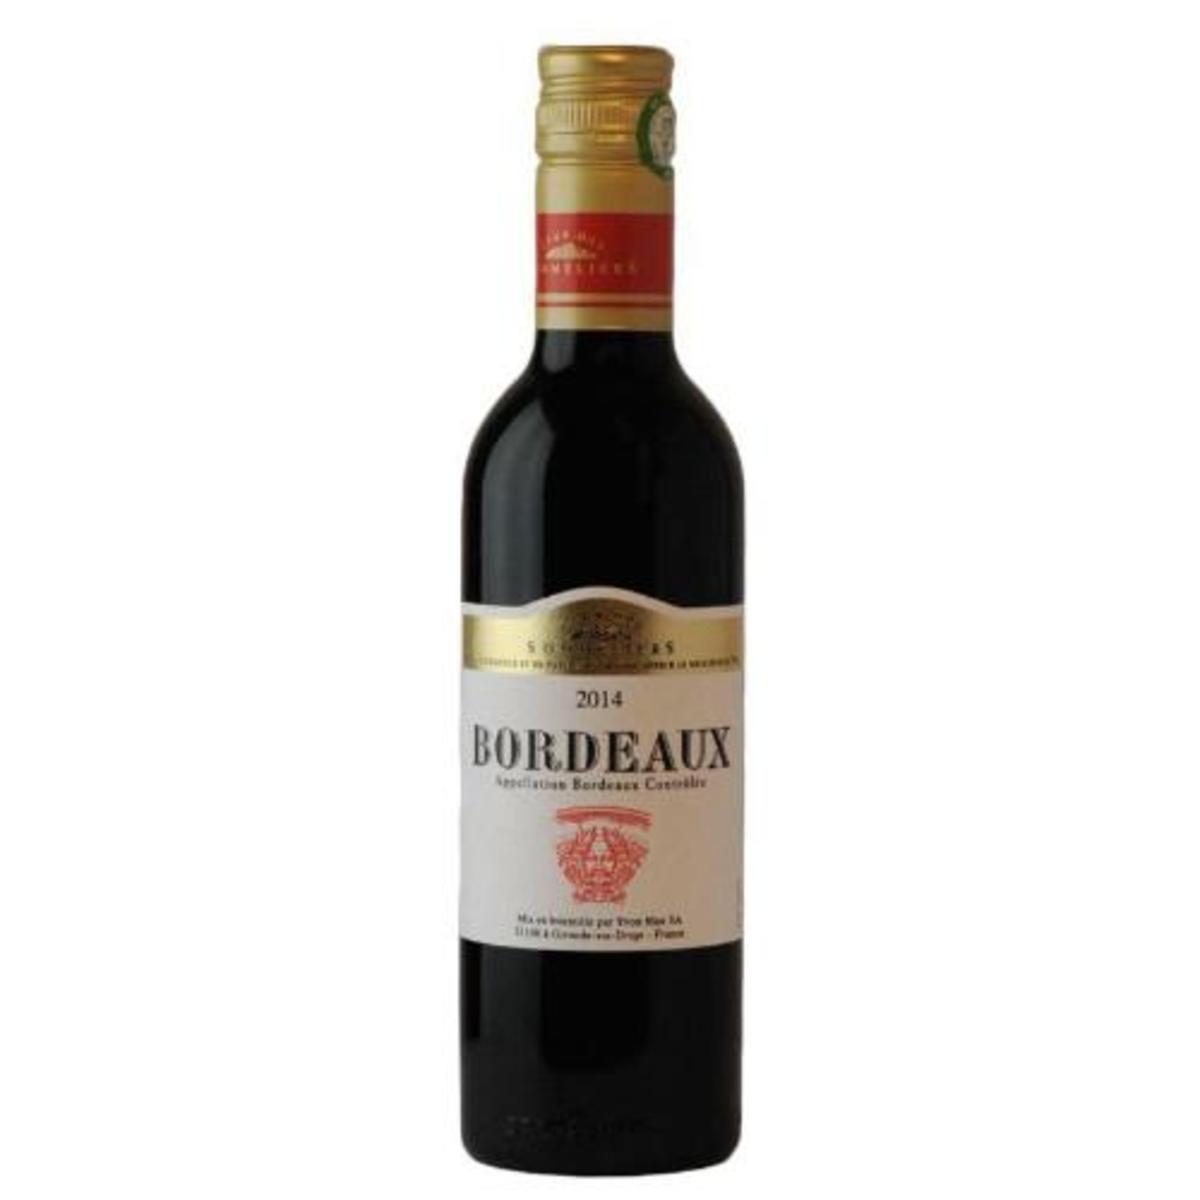 法國直送 - Bordeaux Red Wine Club des Sommeliers (375ml)